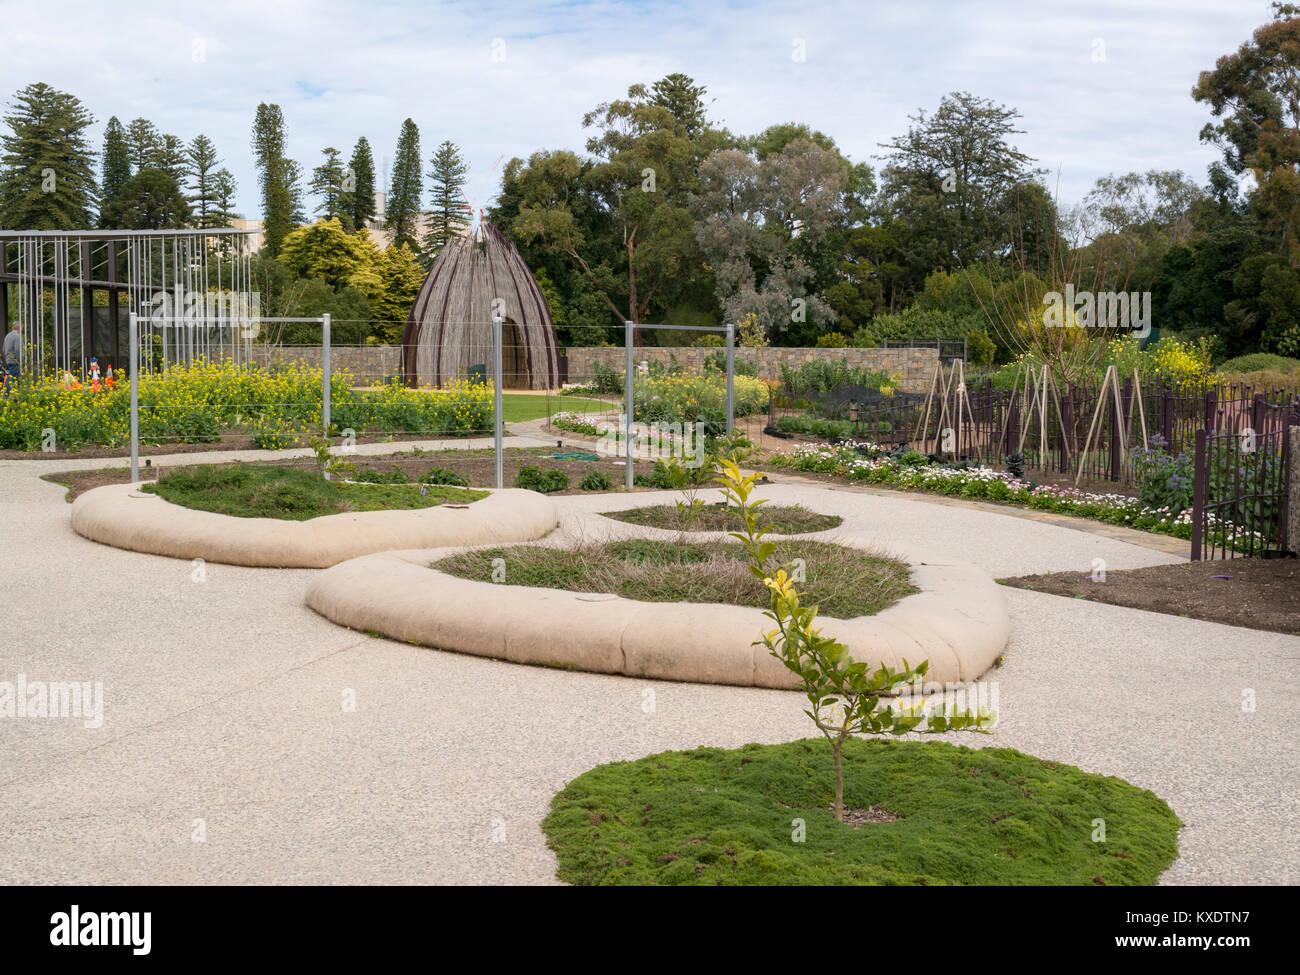 Adelaide, South Australia, Australia - September 10, 2017: The Little Sprouts Kitchen Garden at the Adelaide Botanic Stock Photo